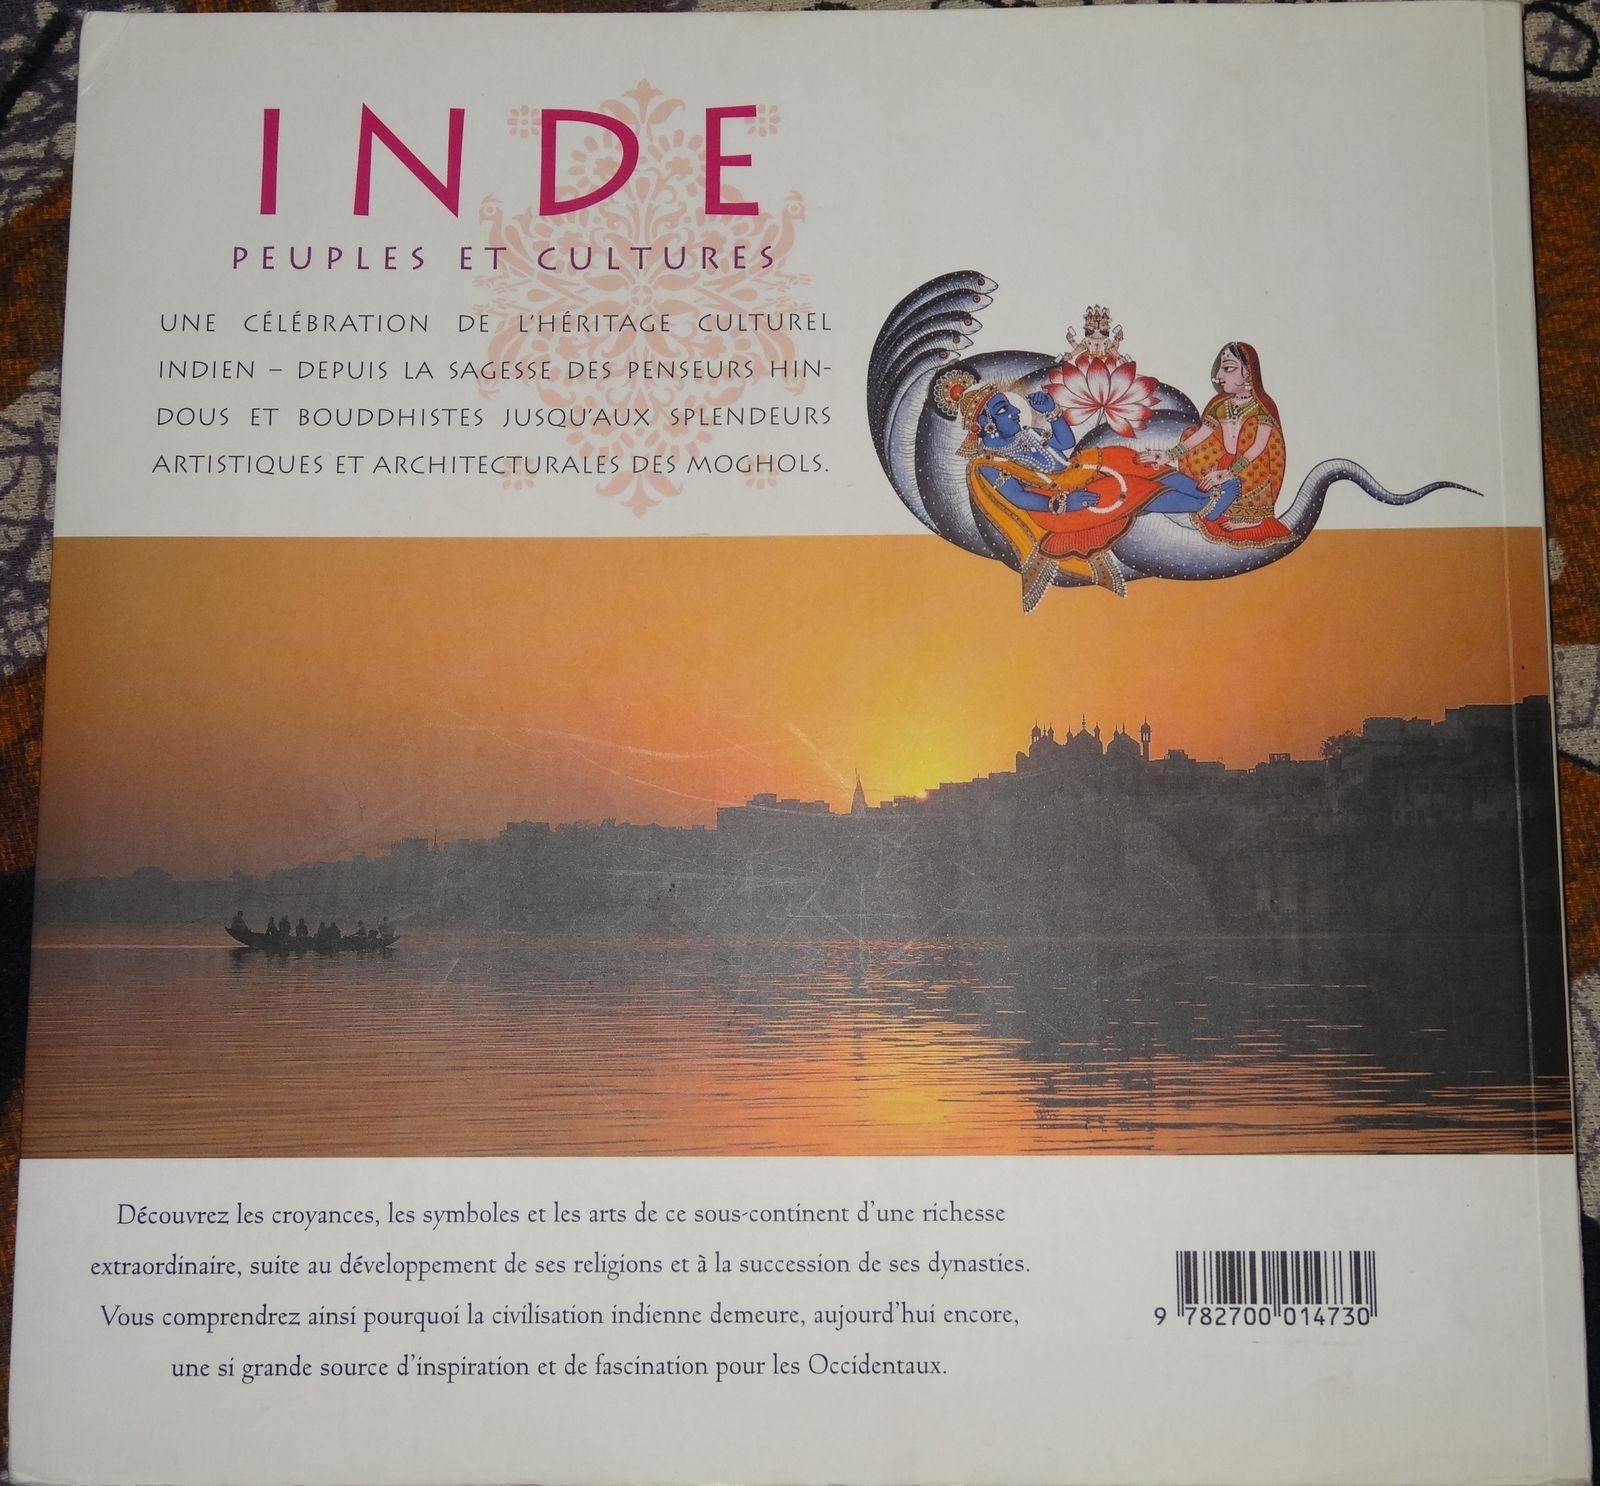 INDE - Peuples et cultures de Chakravarthi Ram-Prasad